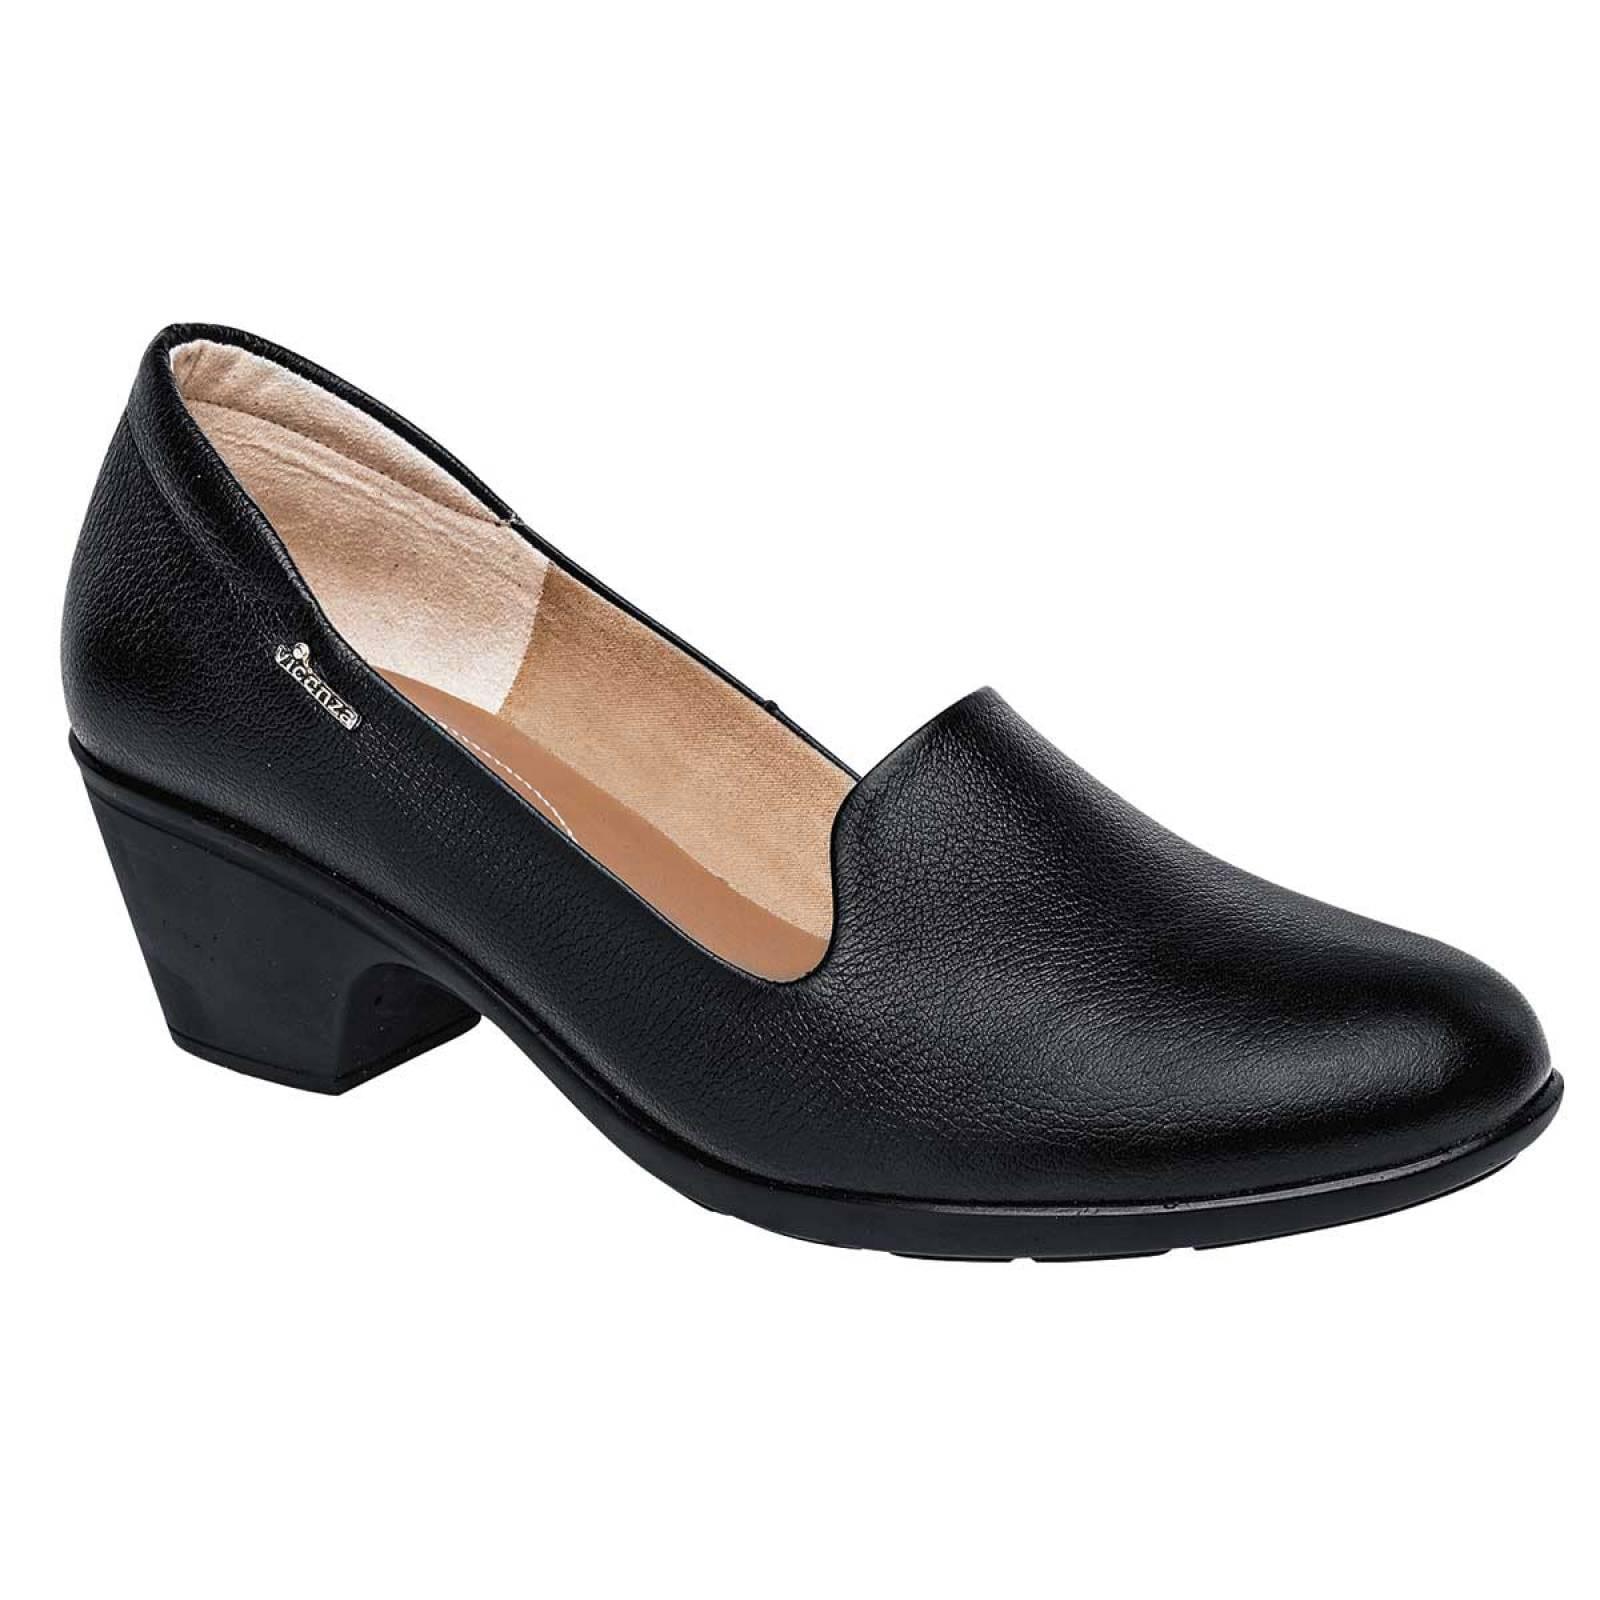 Vicenza Zapato Mujer Negro